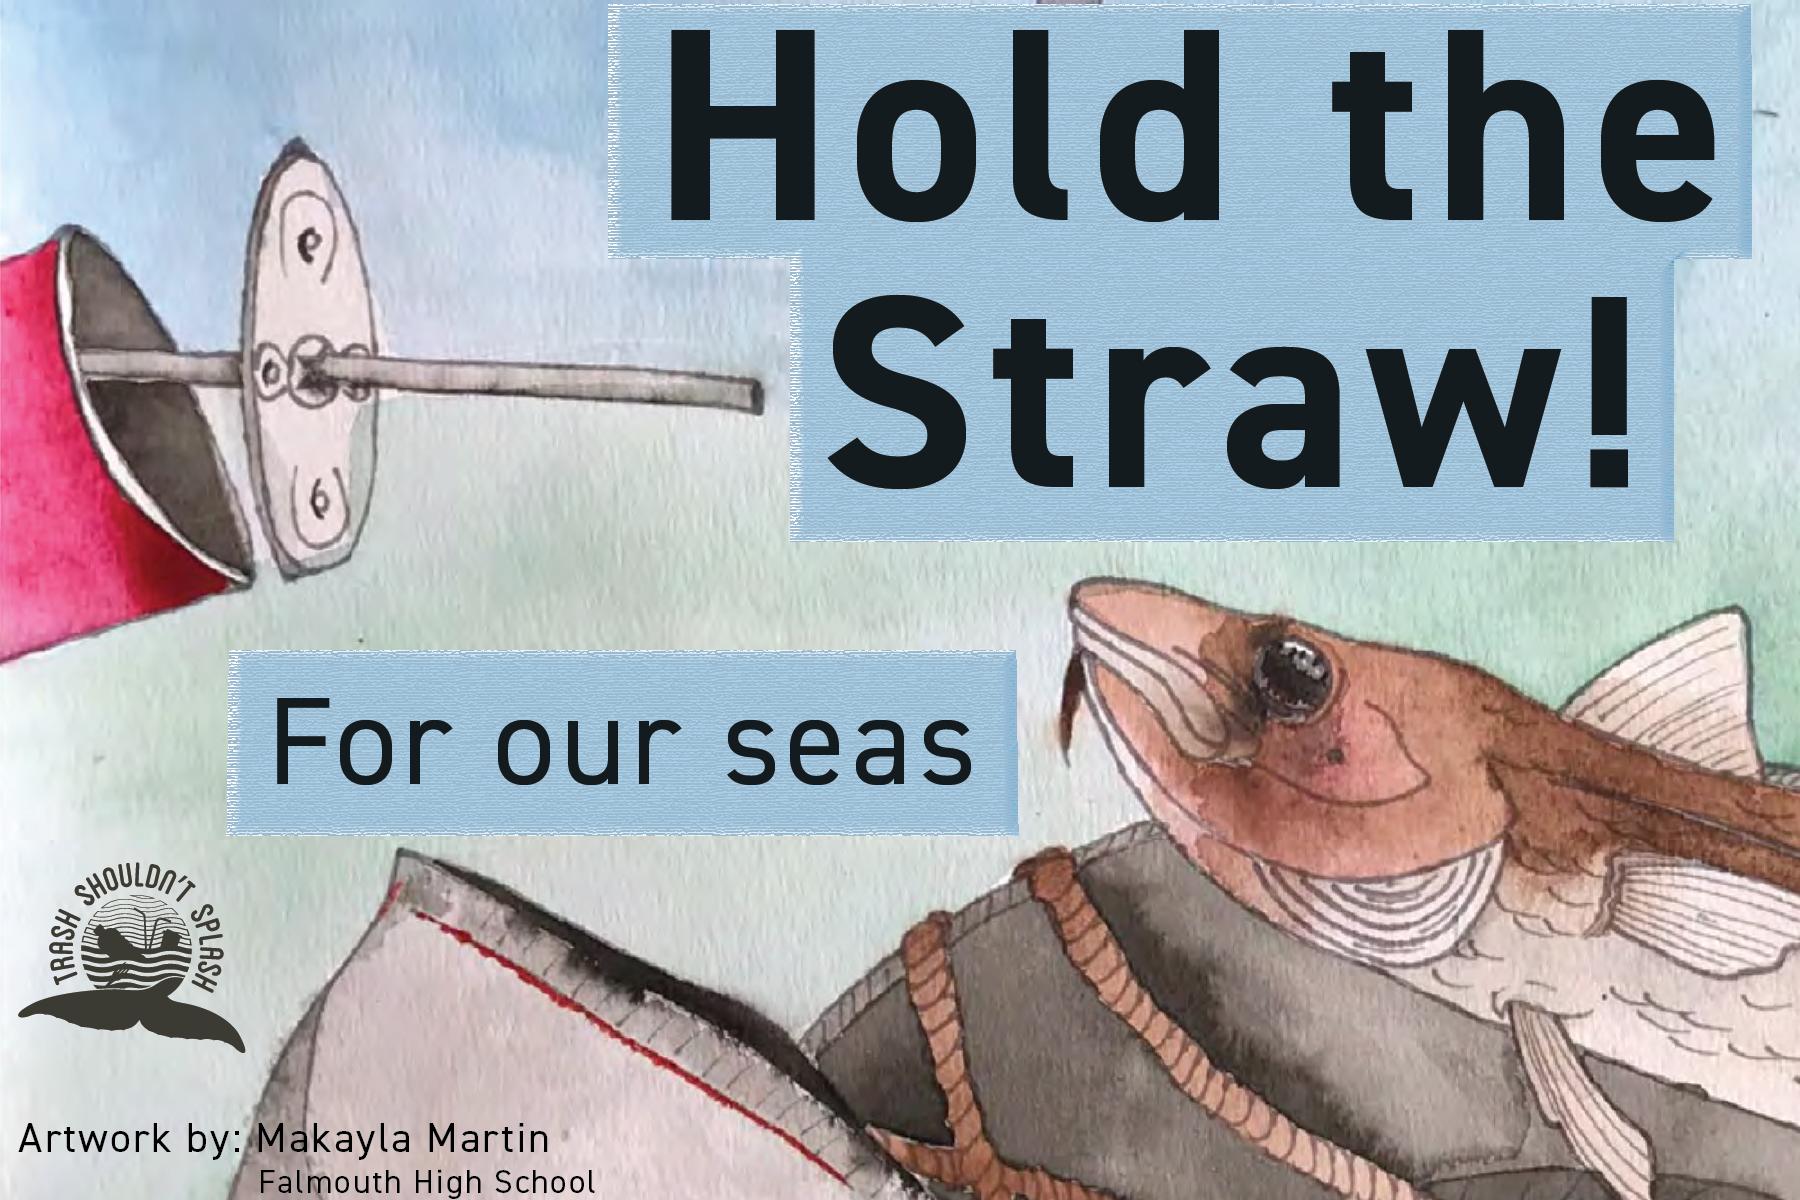 HoldStraw_fish-01.png